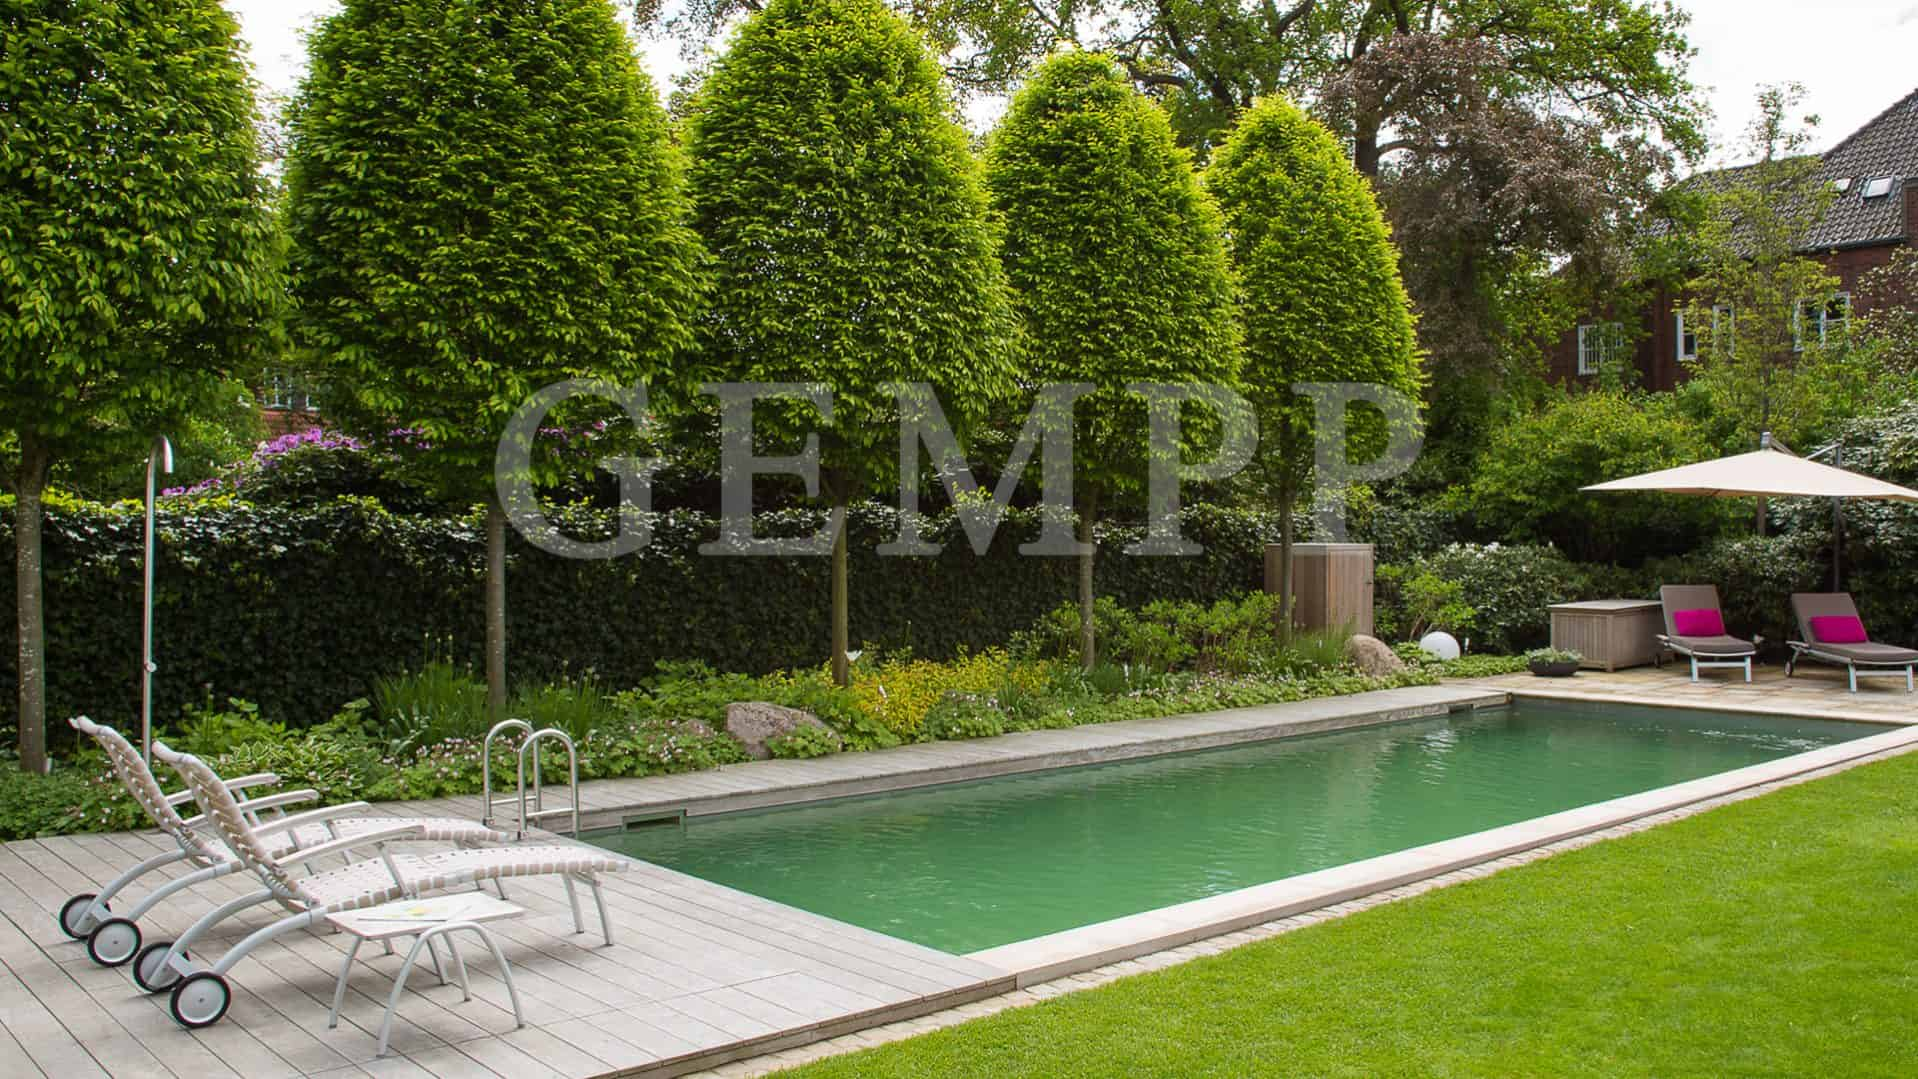 Swimmingpool poolplanung gartenarchitekt gartenplanung gartengestaltung mit pool